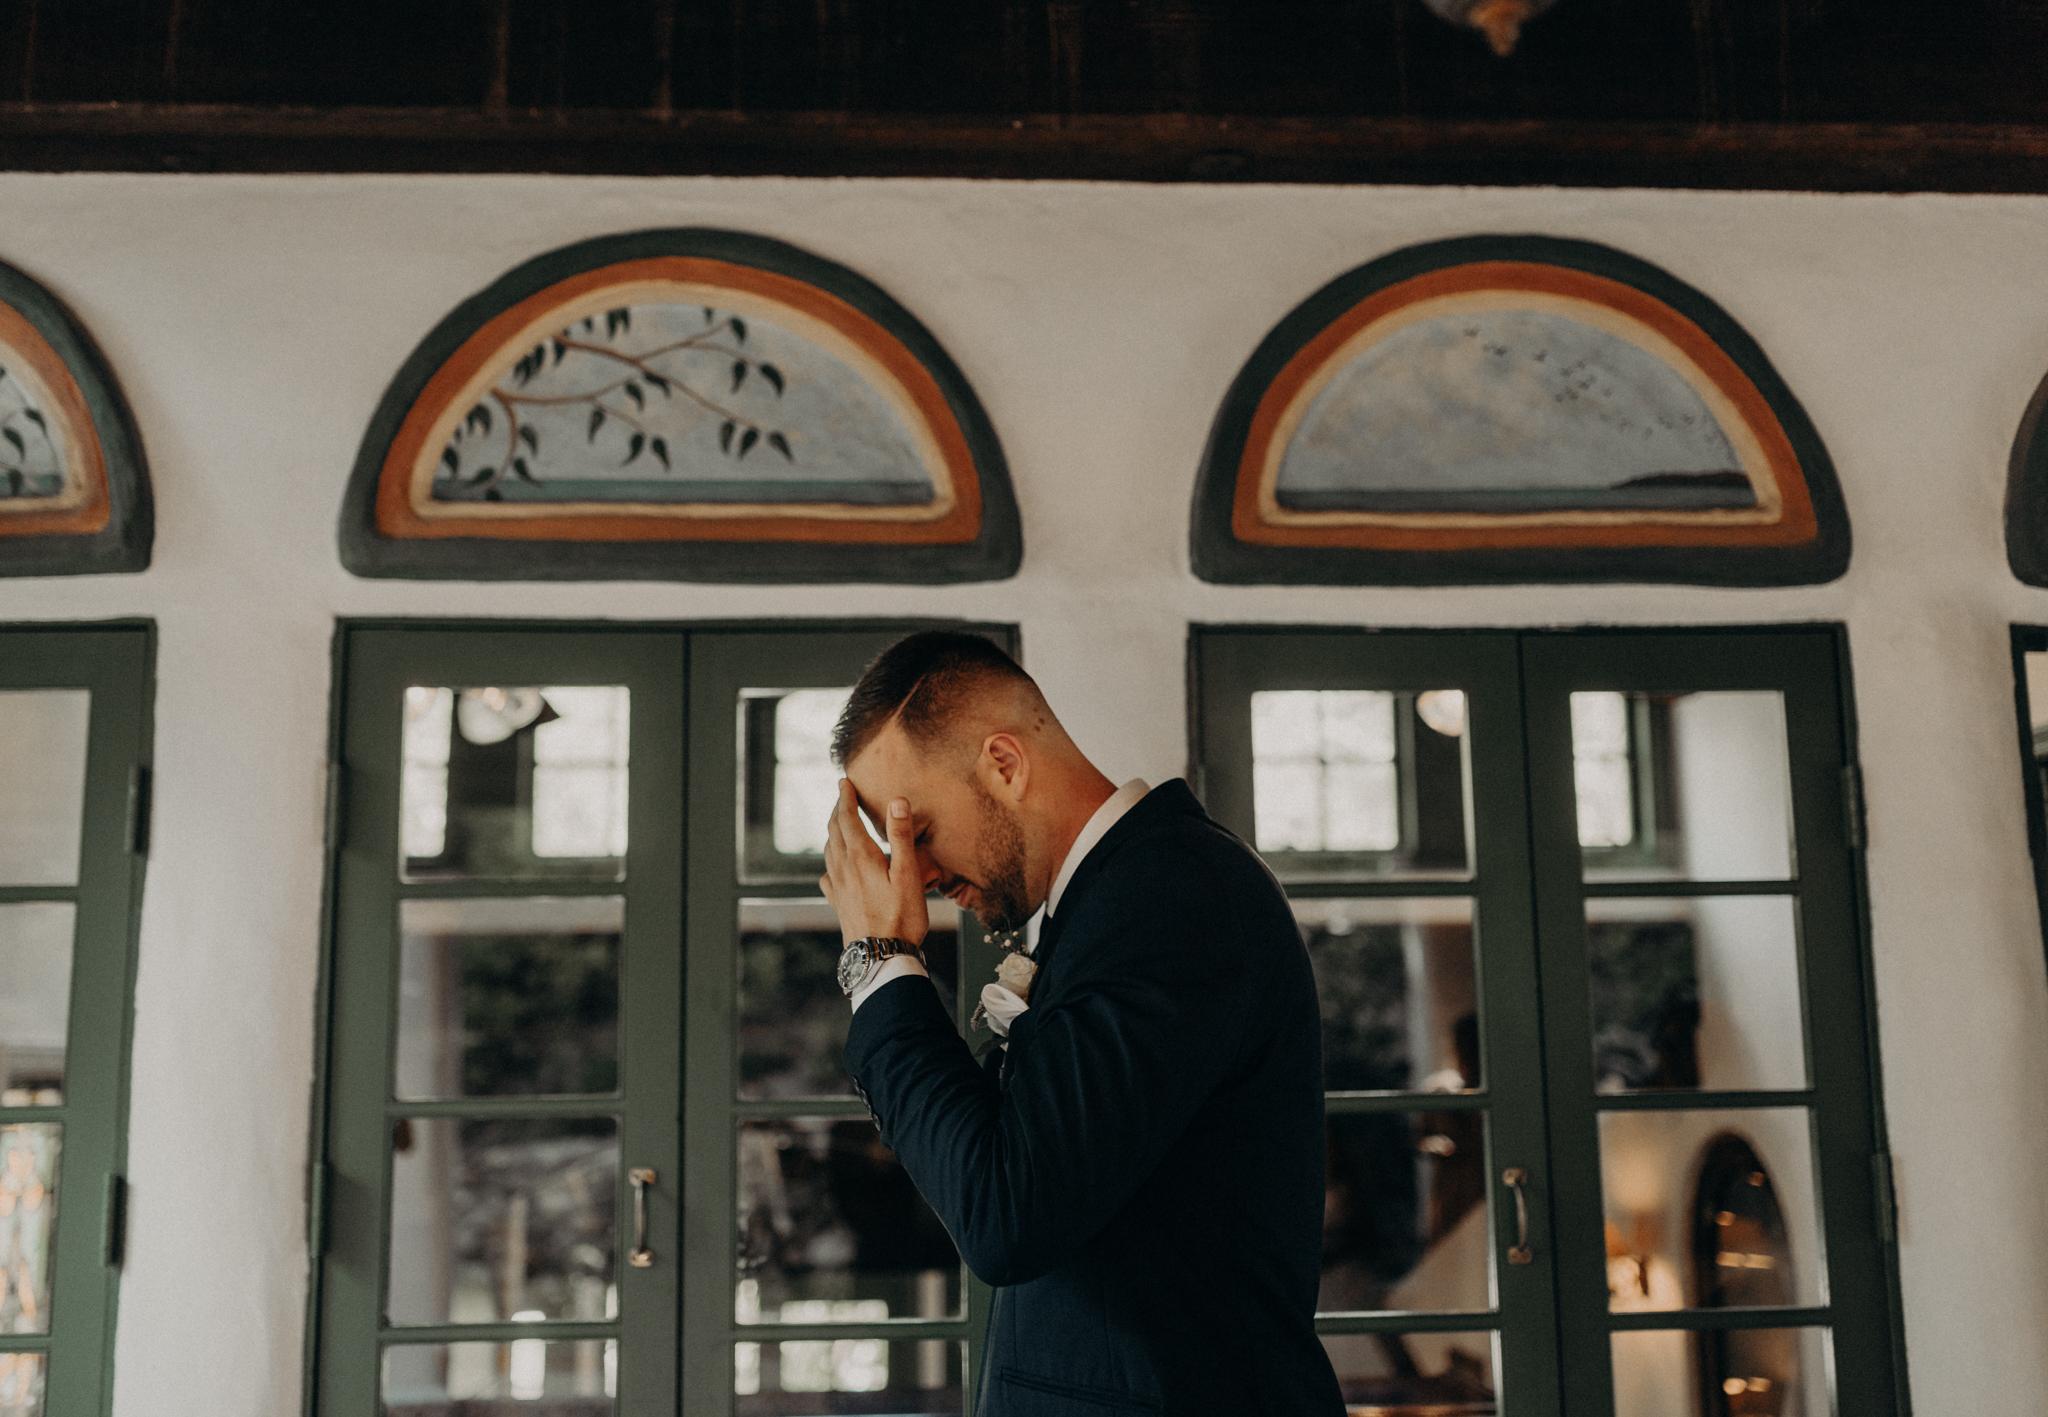 Isaiah + Taylor Photography - Rancho Las Lomas Wedding, Los Angeles Wedding Photographer-032.jpg